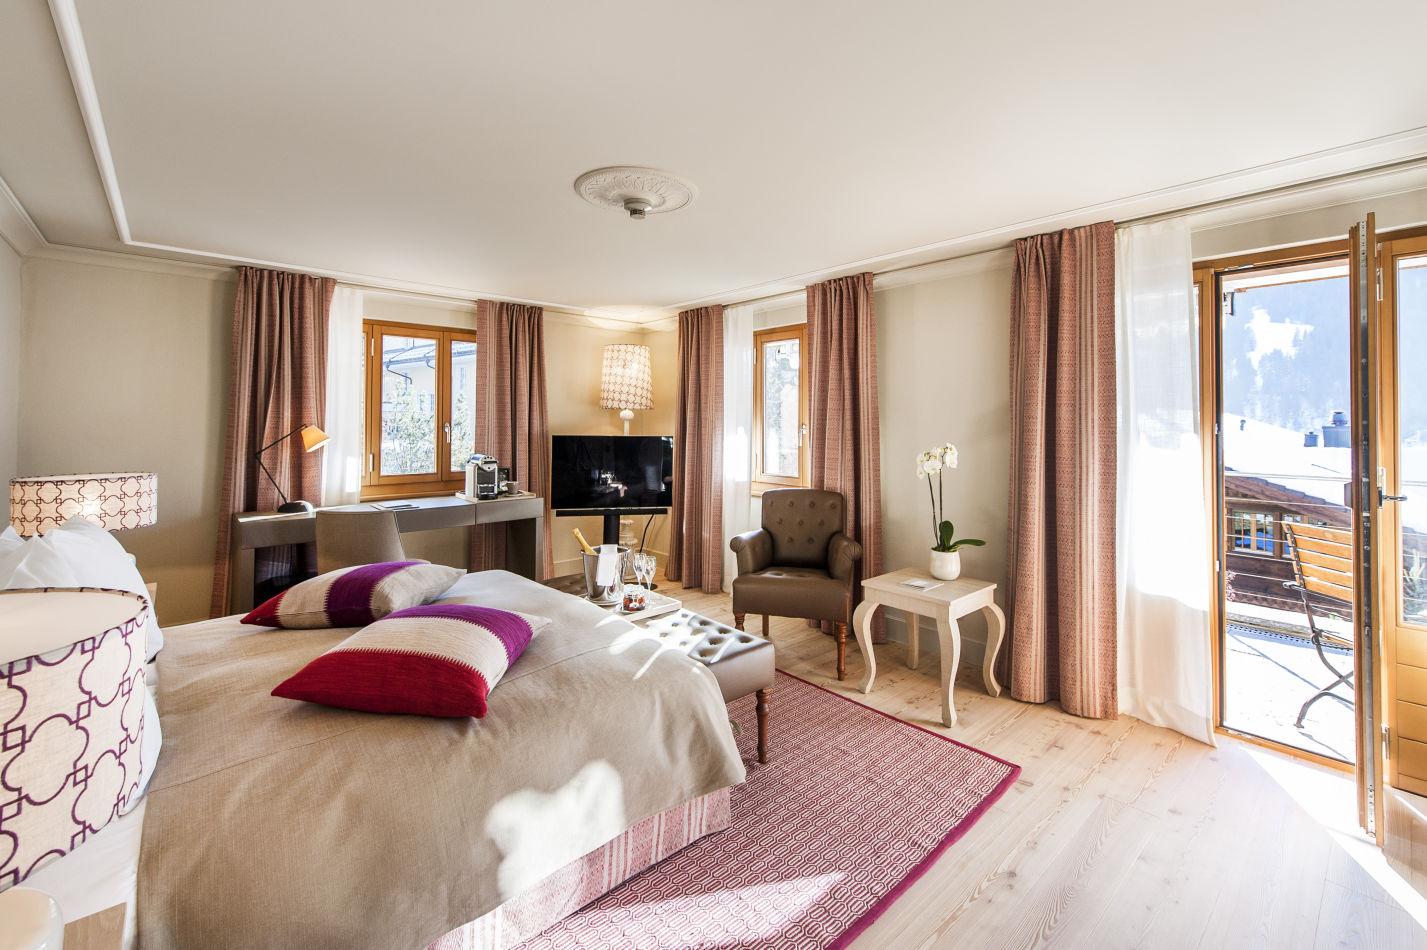 deluxe-chic-room-chalet-2